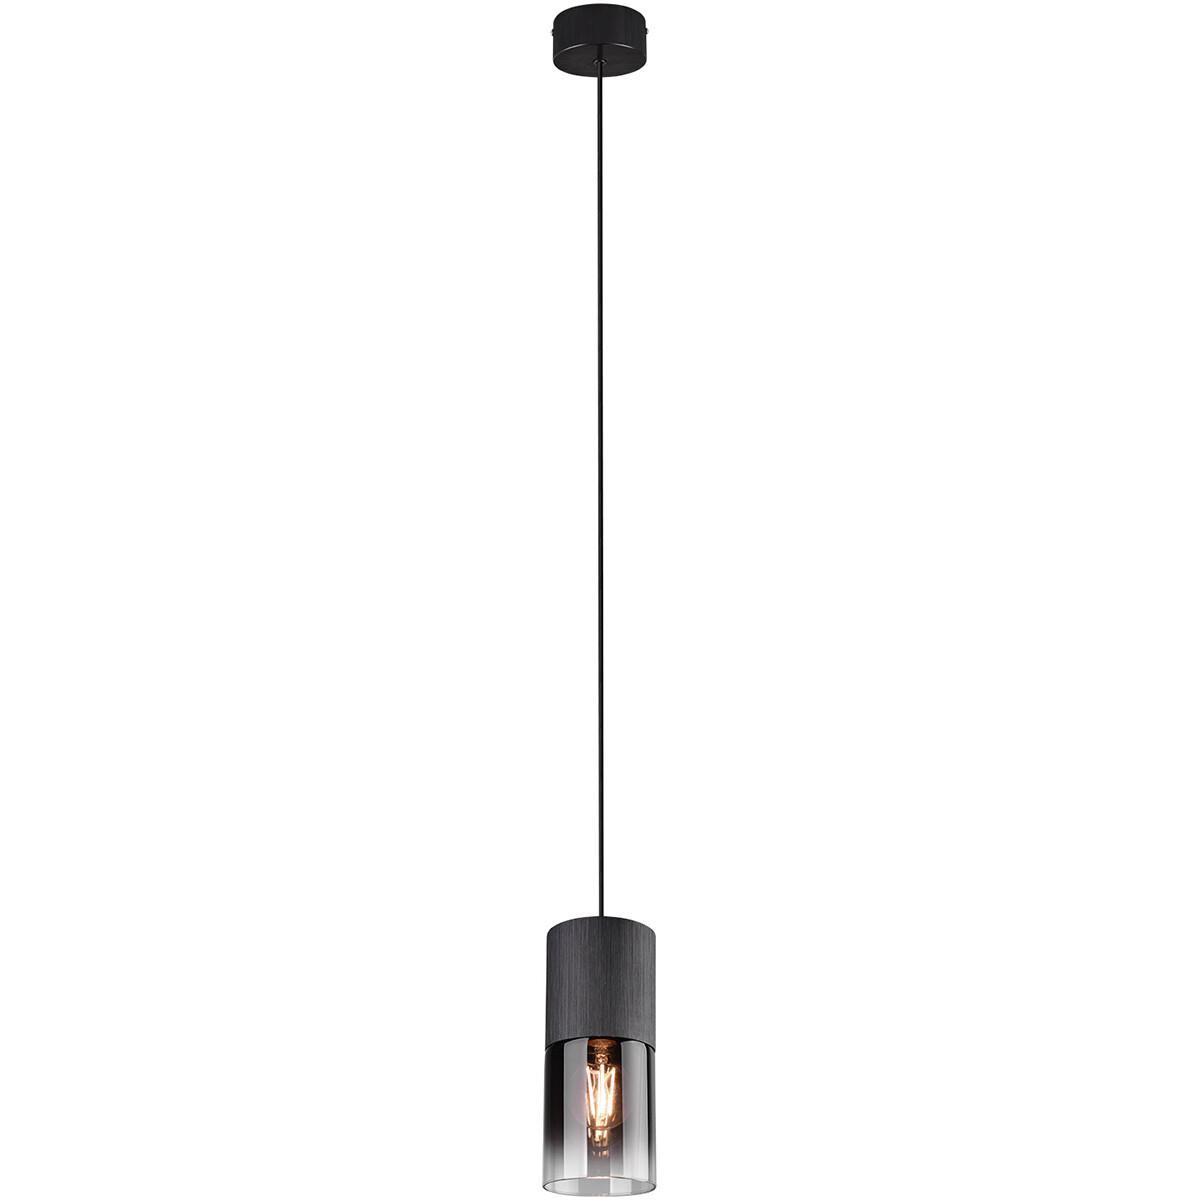 LED Hanglamp - Trion Borin - E27 Fitting - Rond - Mat Zwart - Aluminium